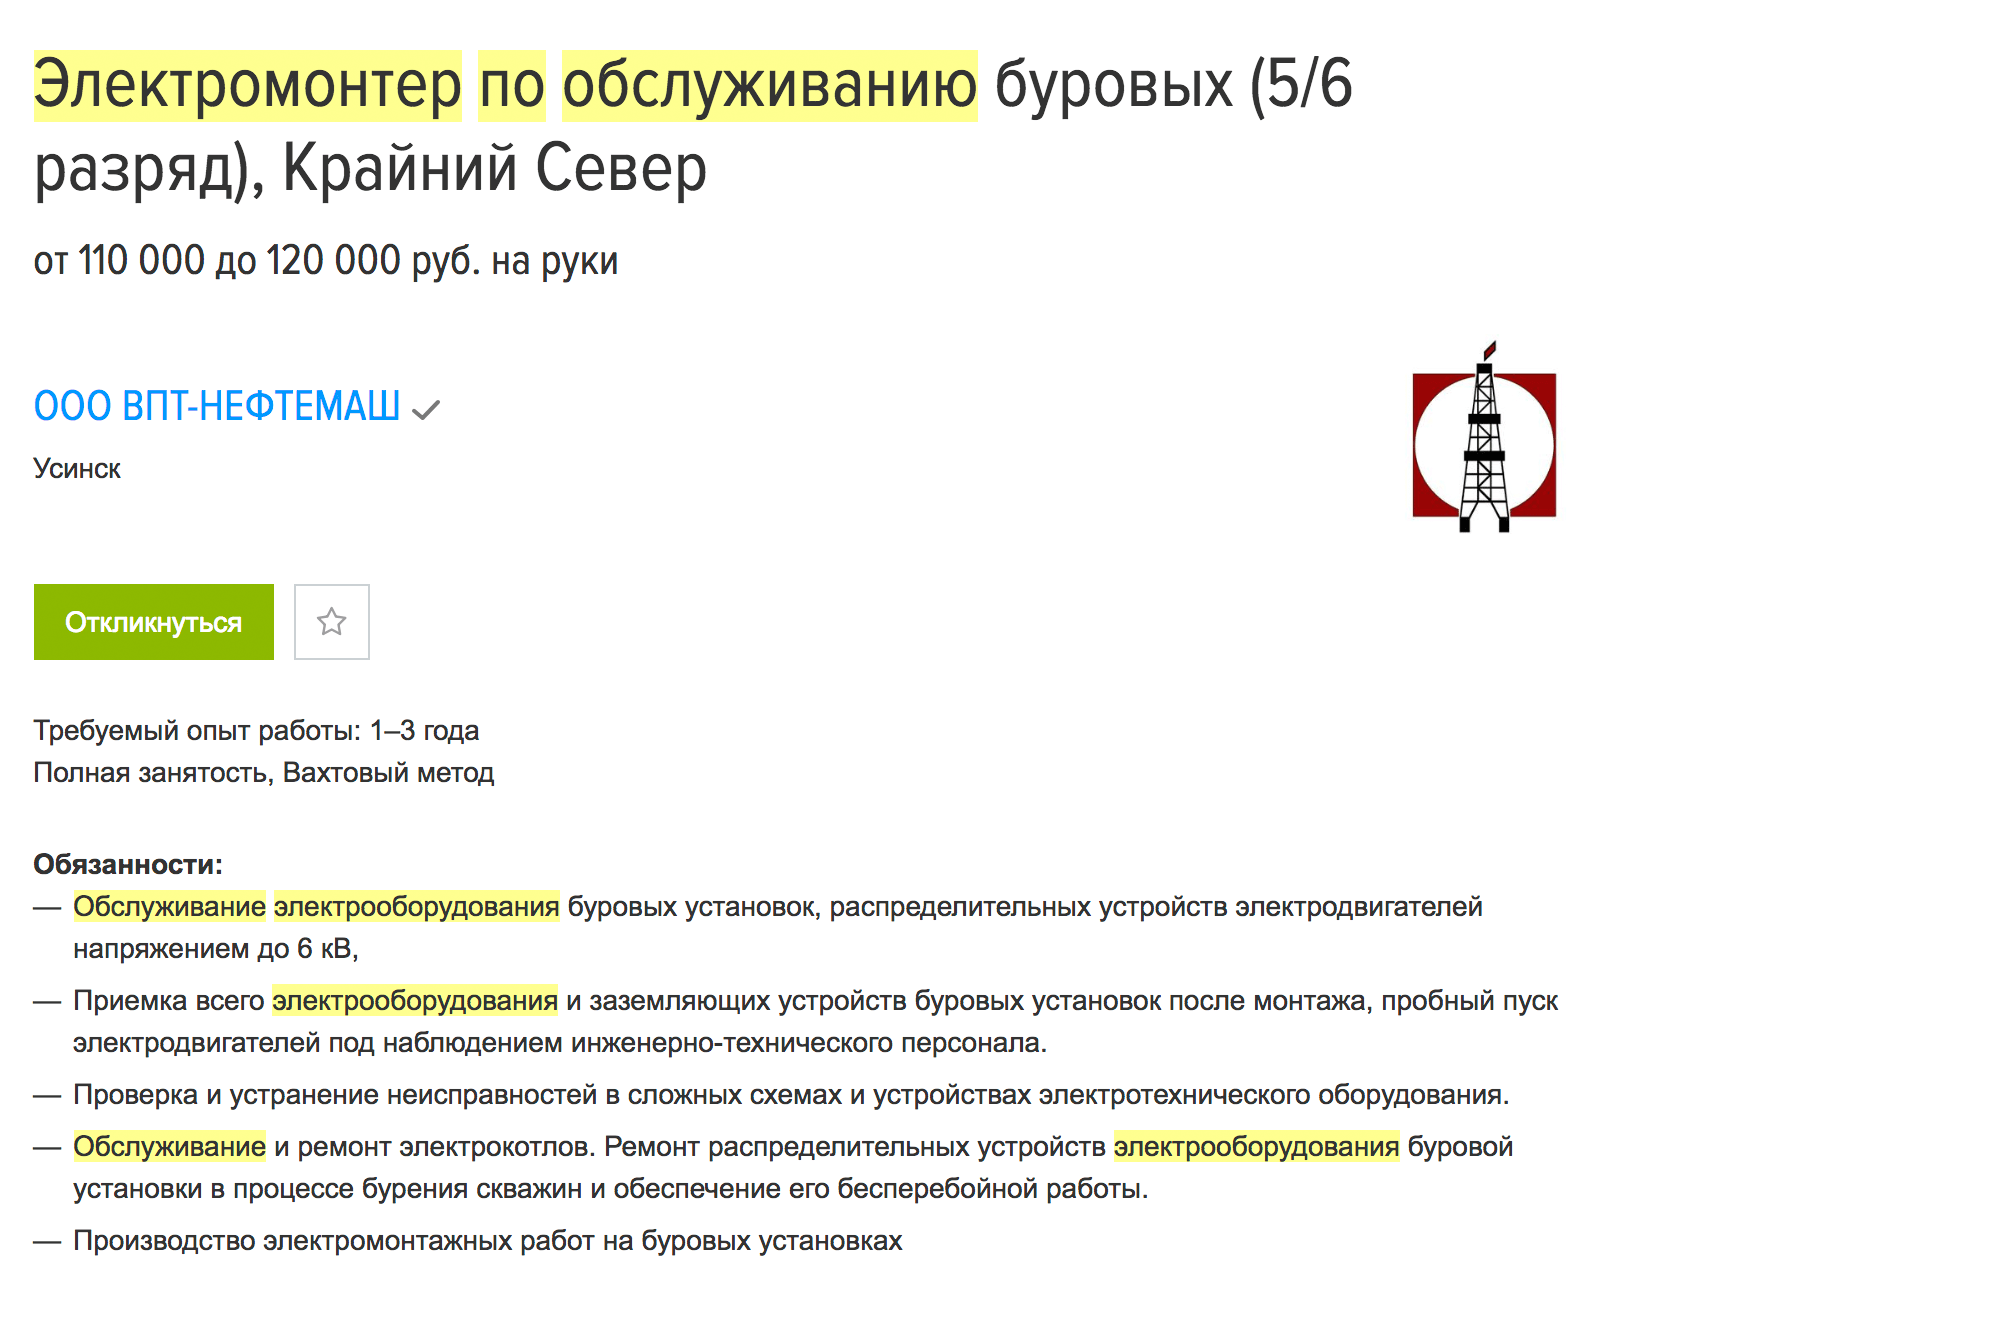 Электромонтер в Республике Коми тоже зарабатывает на вахте до 100 000 р.